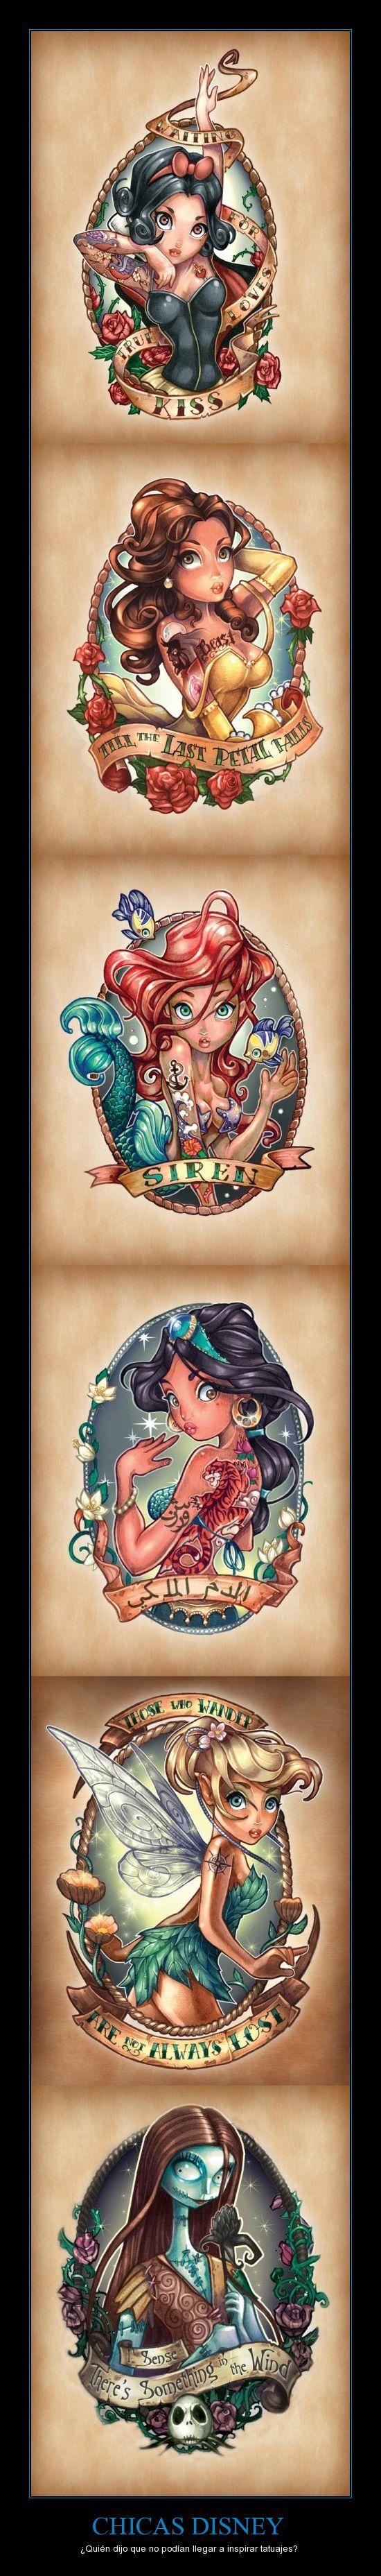 CHICAS DISNEY - ¿Quién dijo que no podían llegar a inspirar tatuajes? Translate please. Hehe.